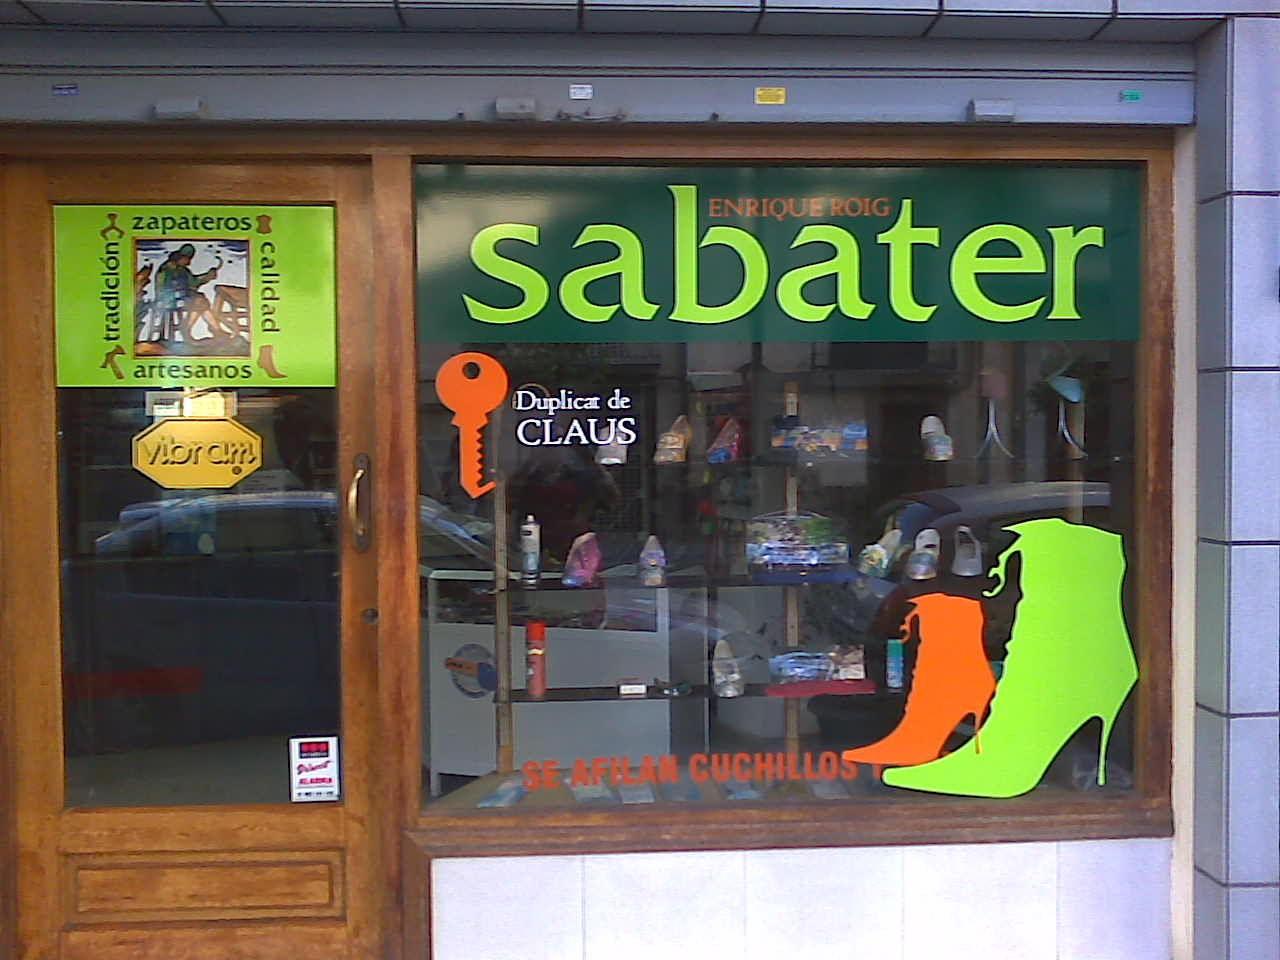 Foto 16 de Reparación de calzado en Castellón | Roig Vidal